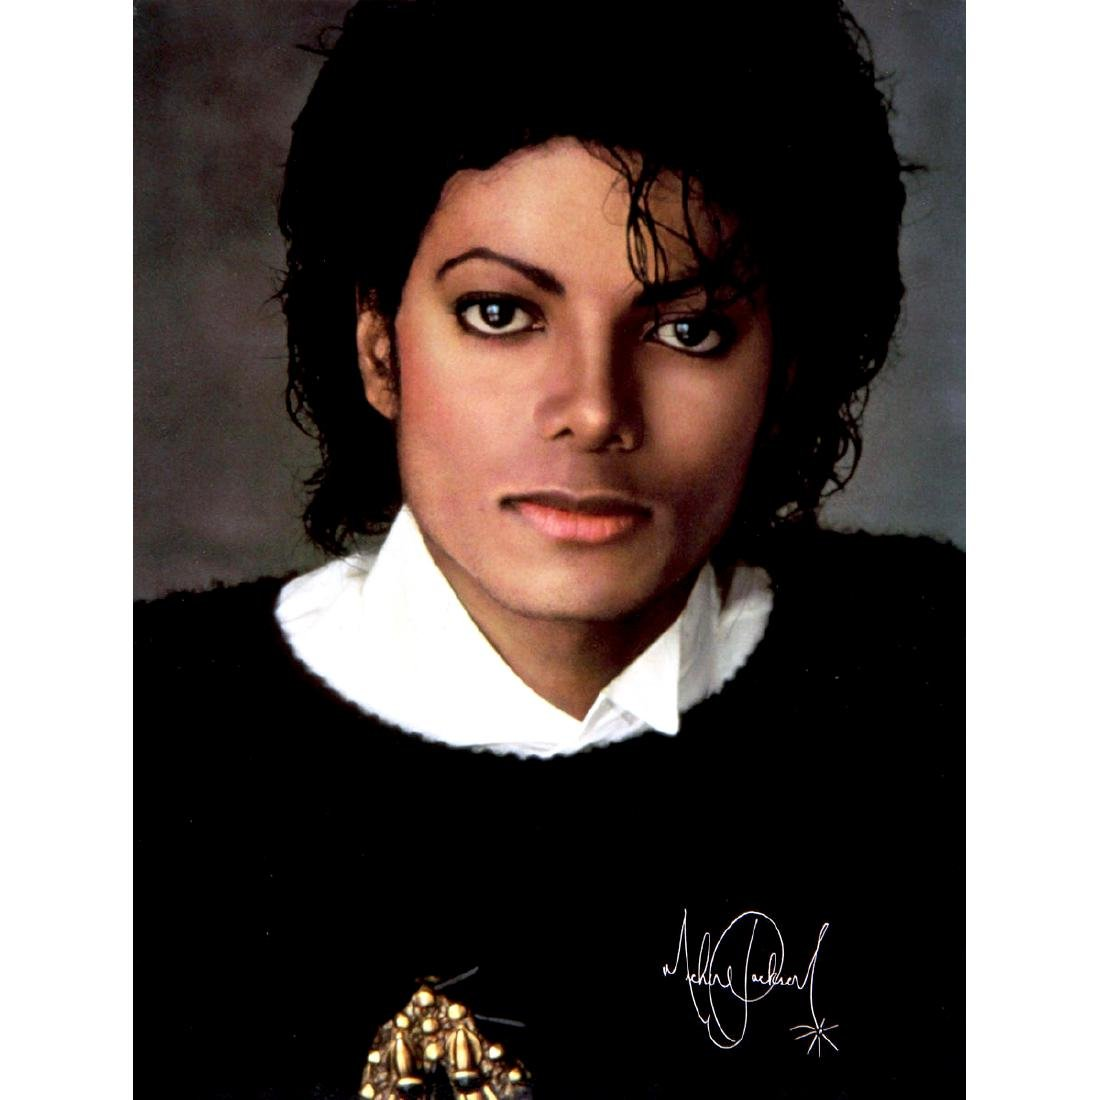 Michael Jackson - Thriller - 1982 Plate Signed Poster